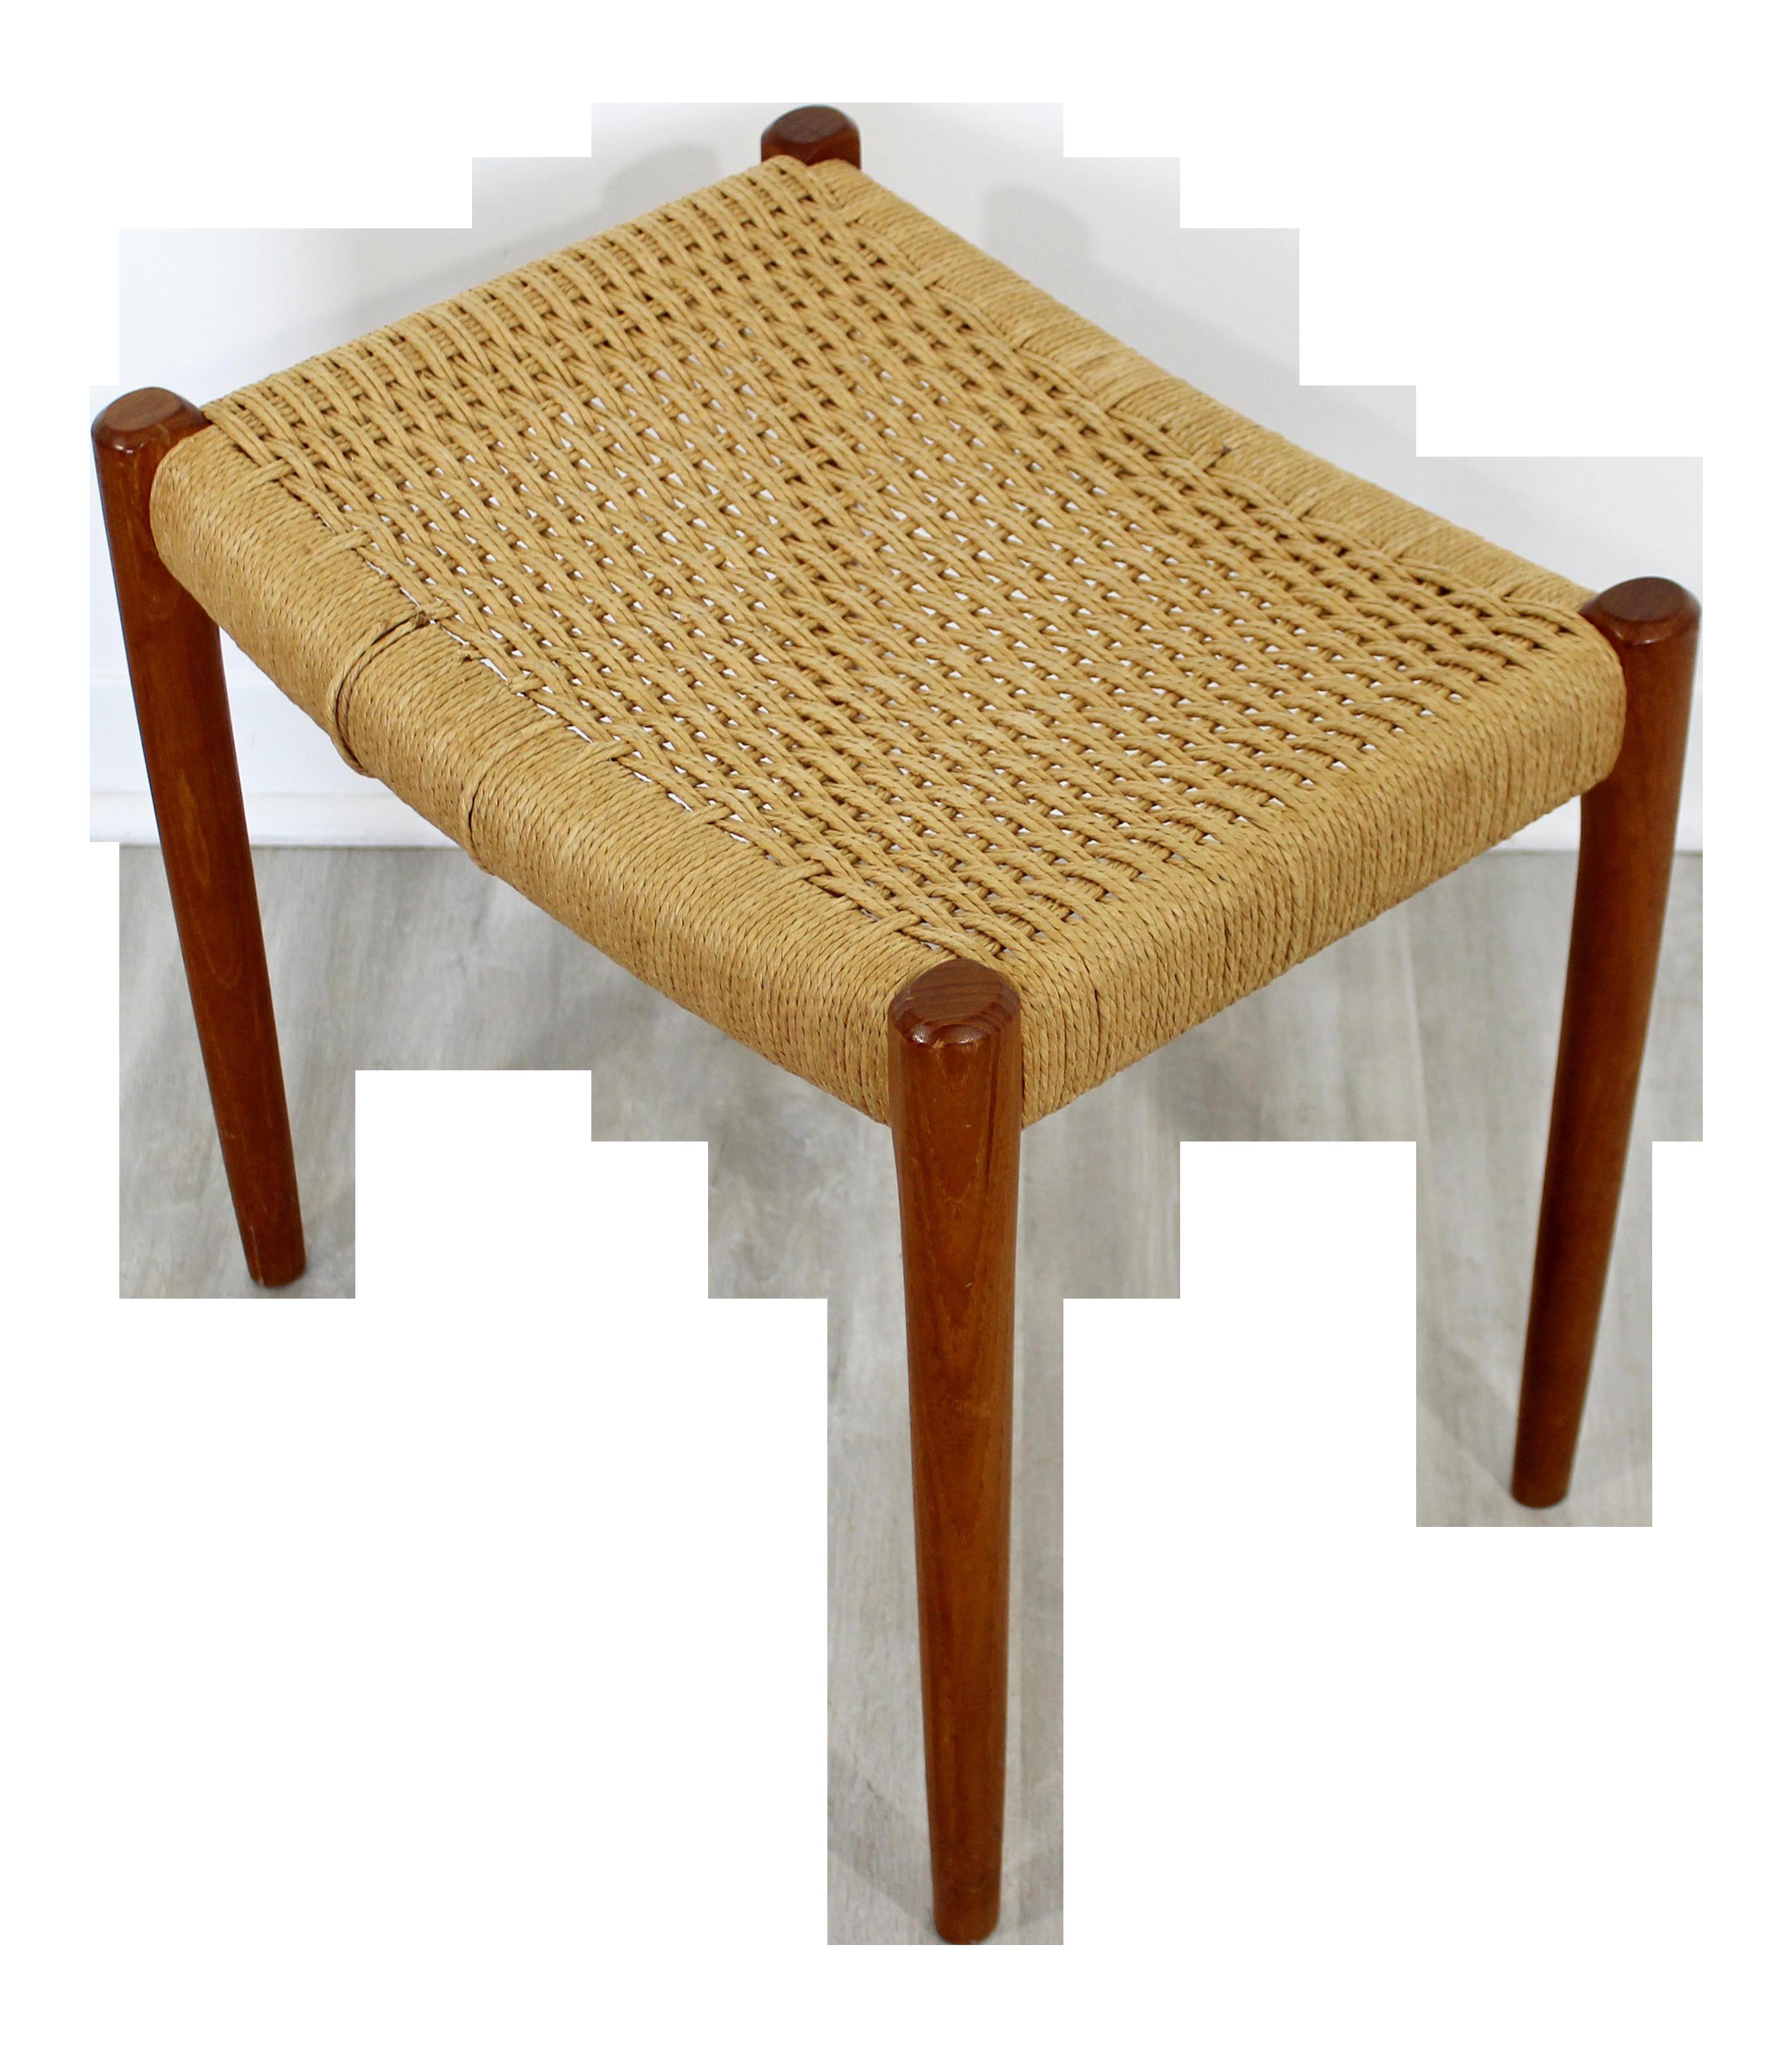 Image of: Mid Century Modern Neils Moller Danish Rope Teak Bench Seat Footstool 1960s Chairish